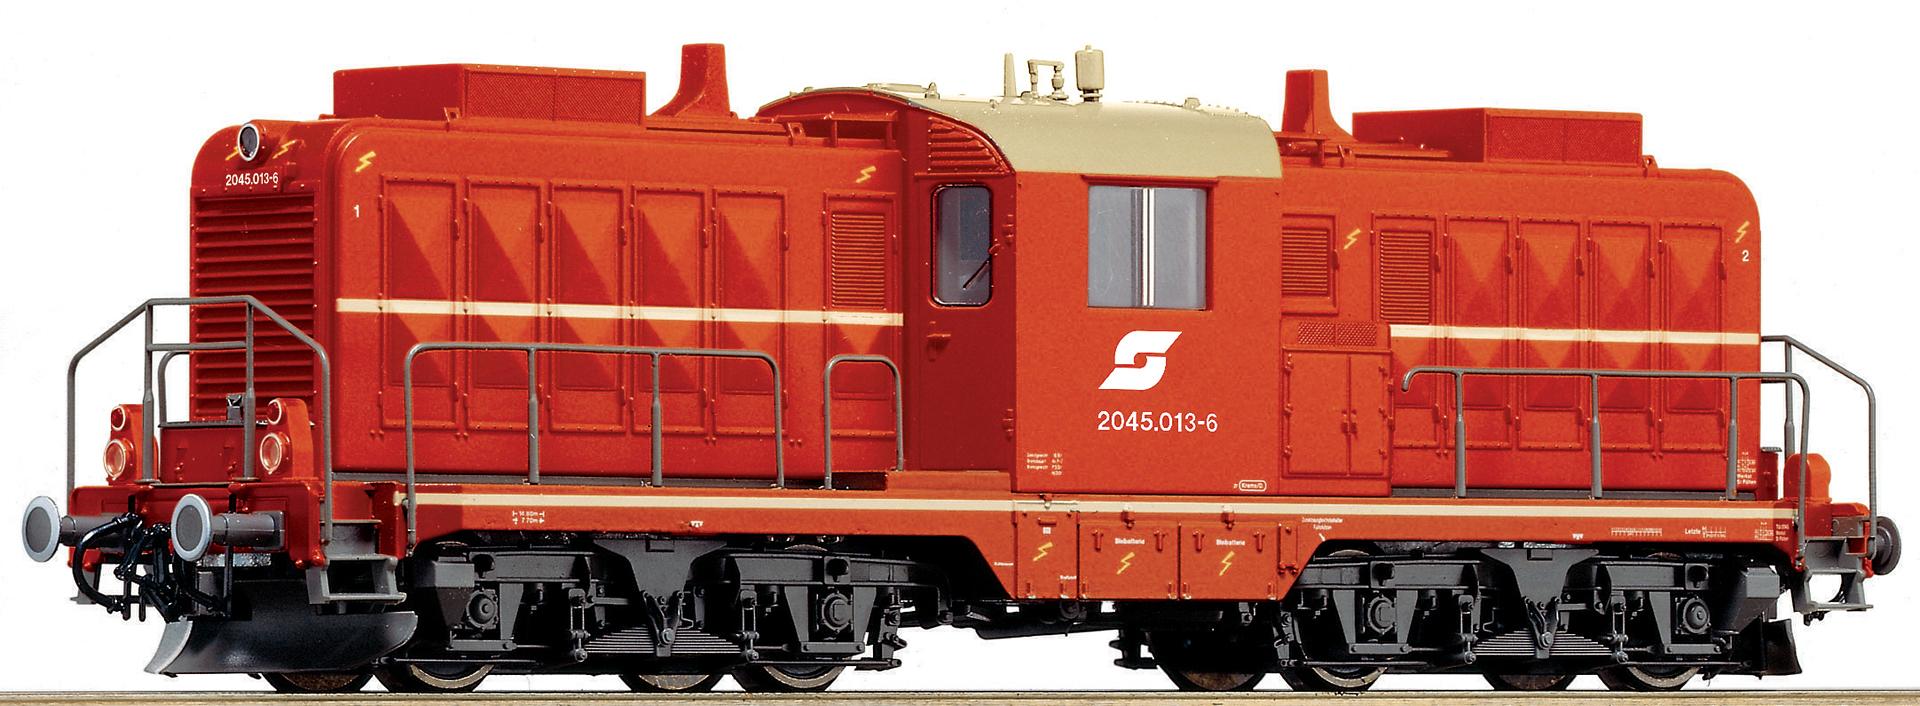 Diesel locomotive Rh 2045